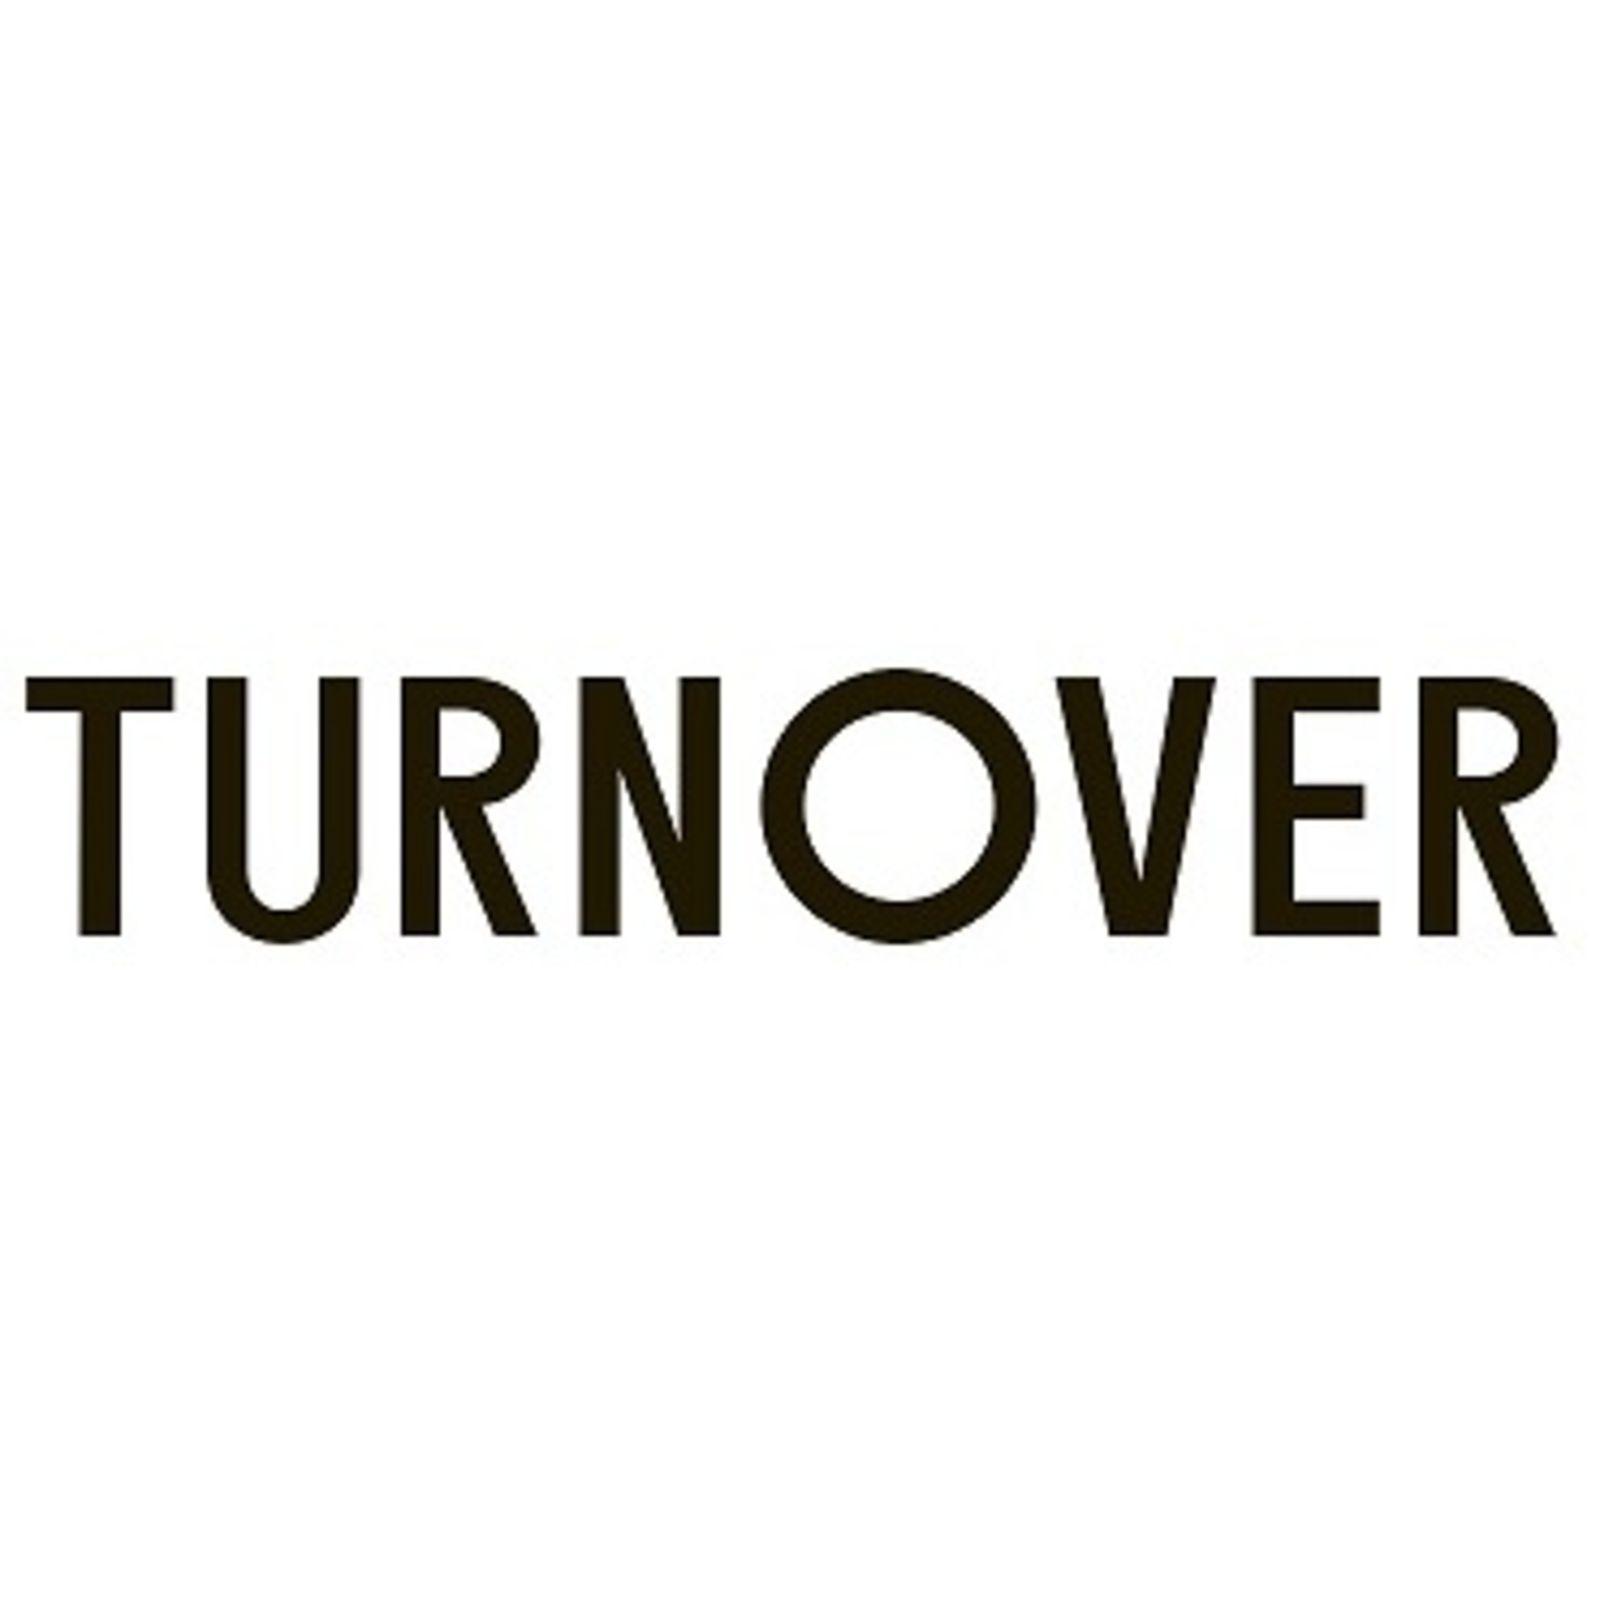 TURNOVER (Bild 1)